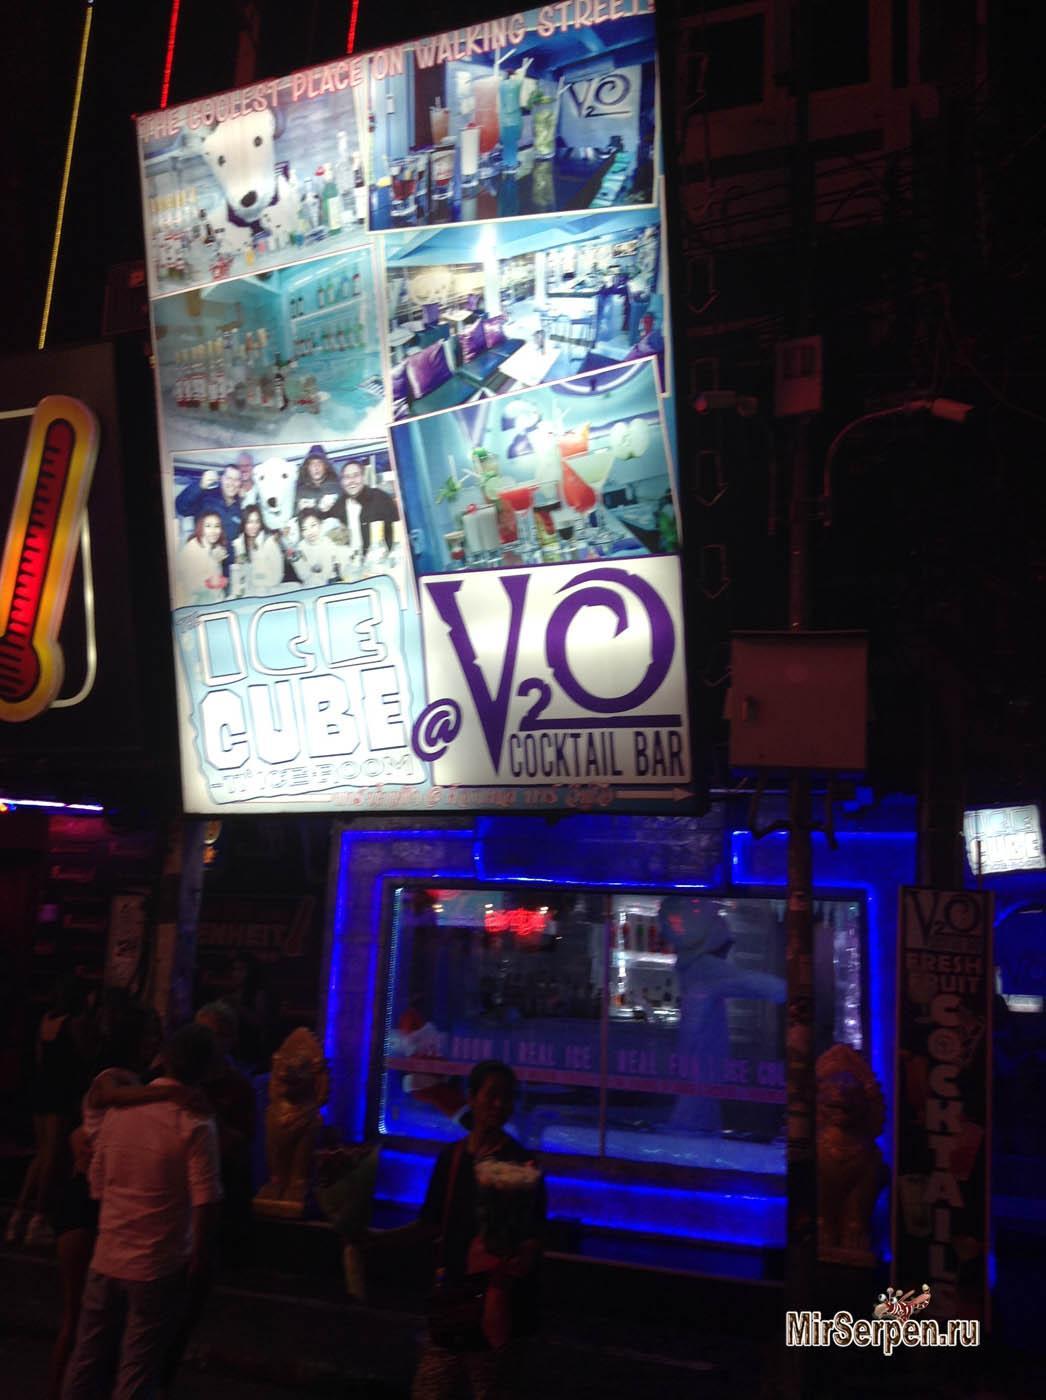 Про Паттайю: ICE BAR V2O Pattaya